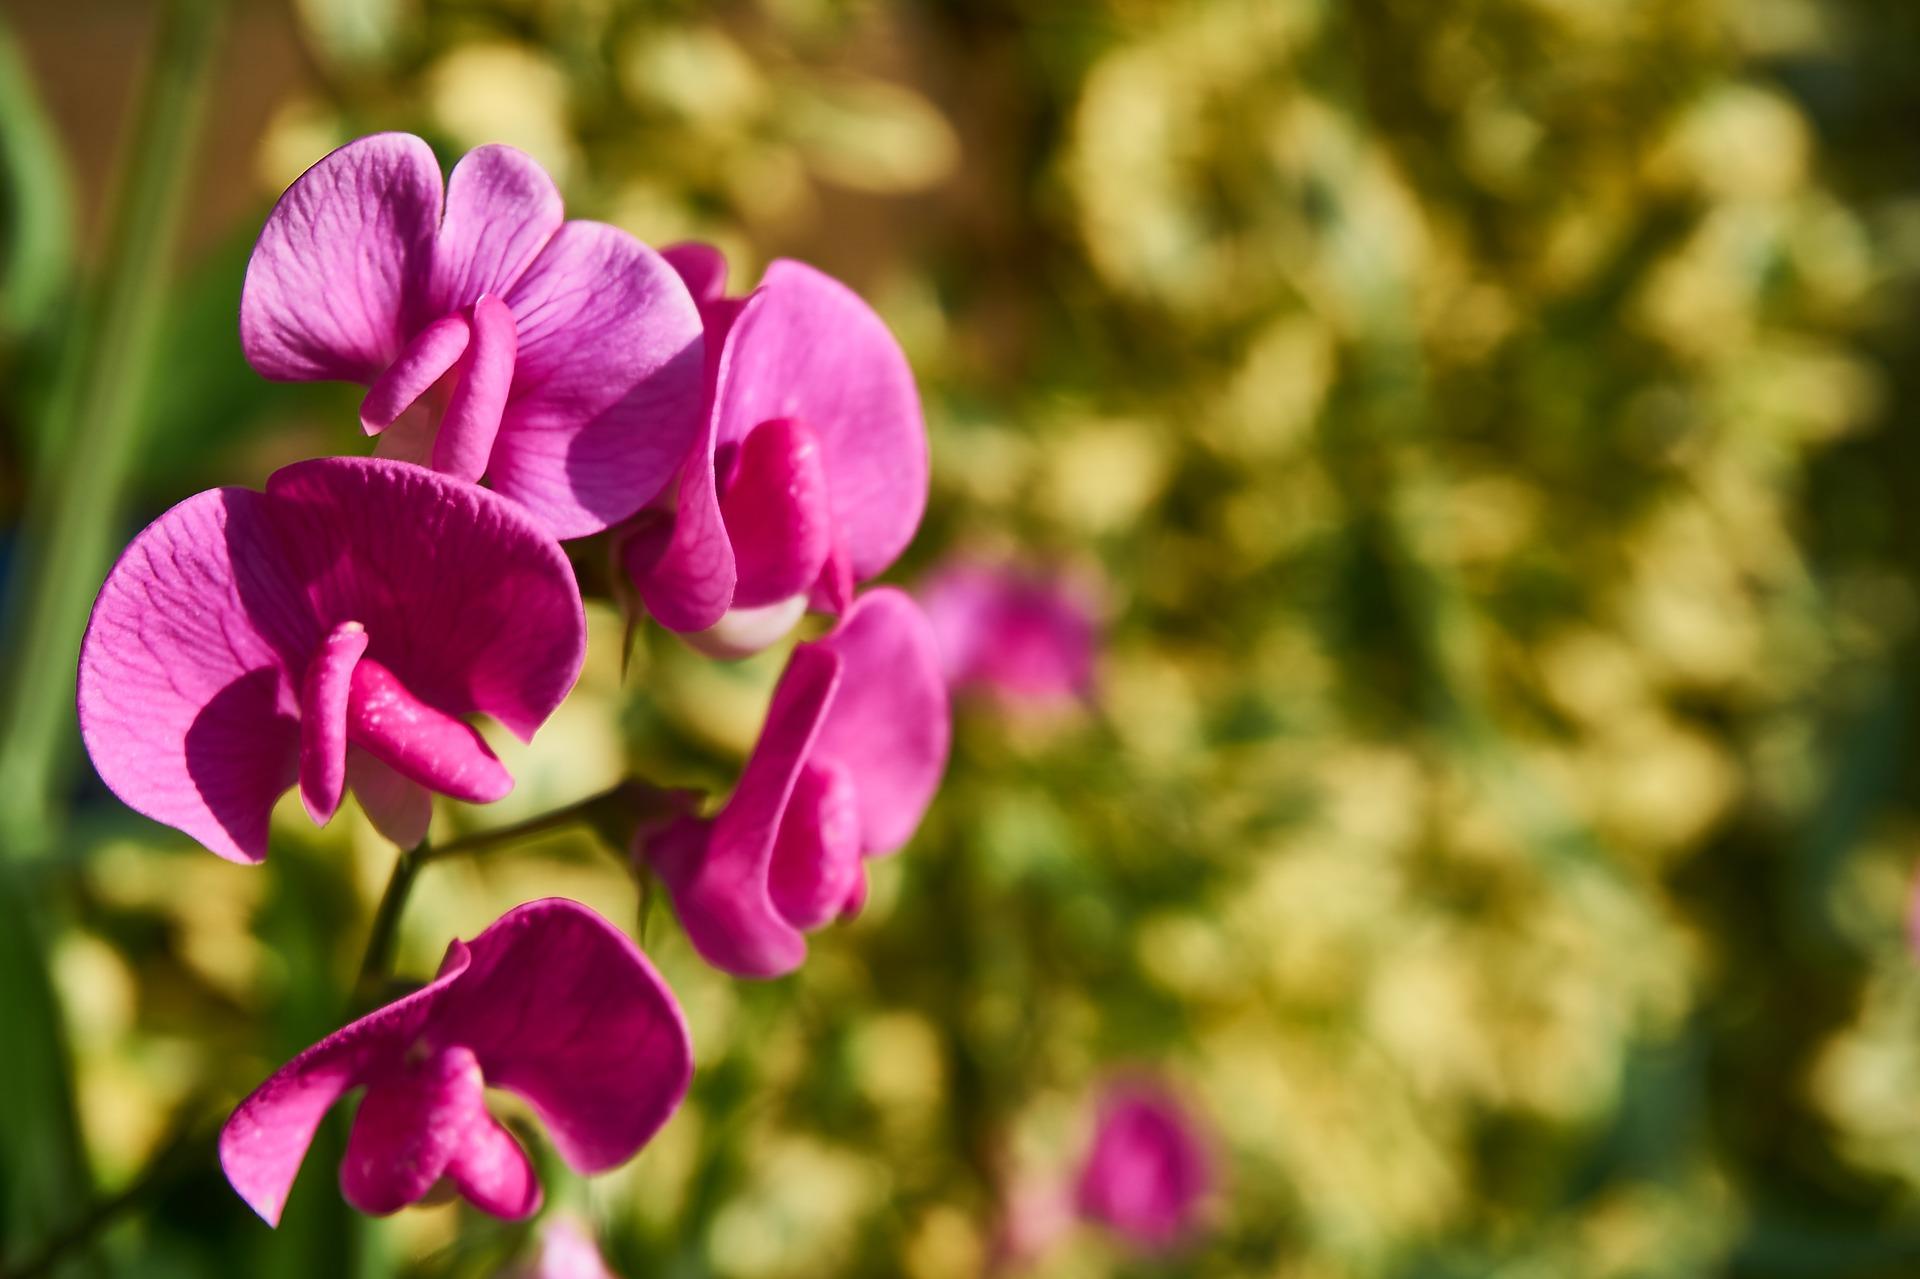 Planten verdroogd? Deze bijenplanten kunnen wèl tegen de droogte